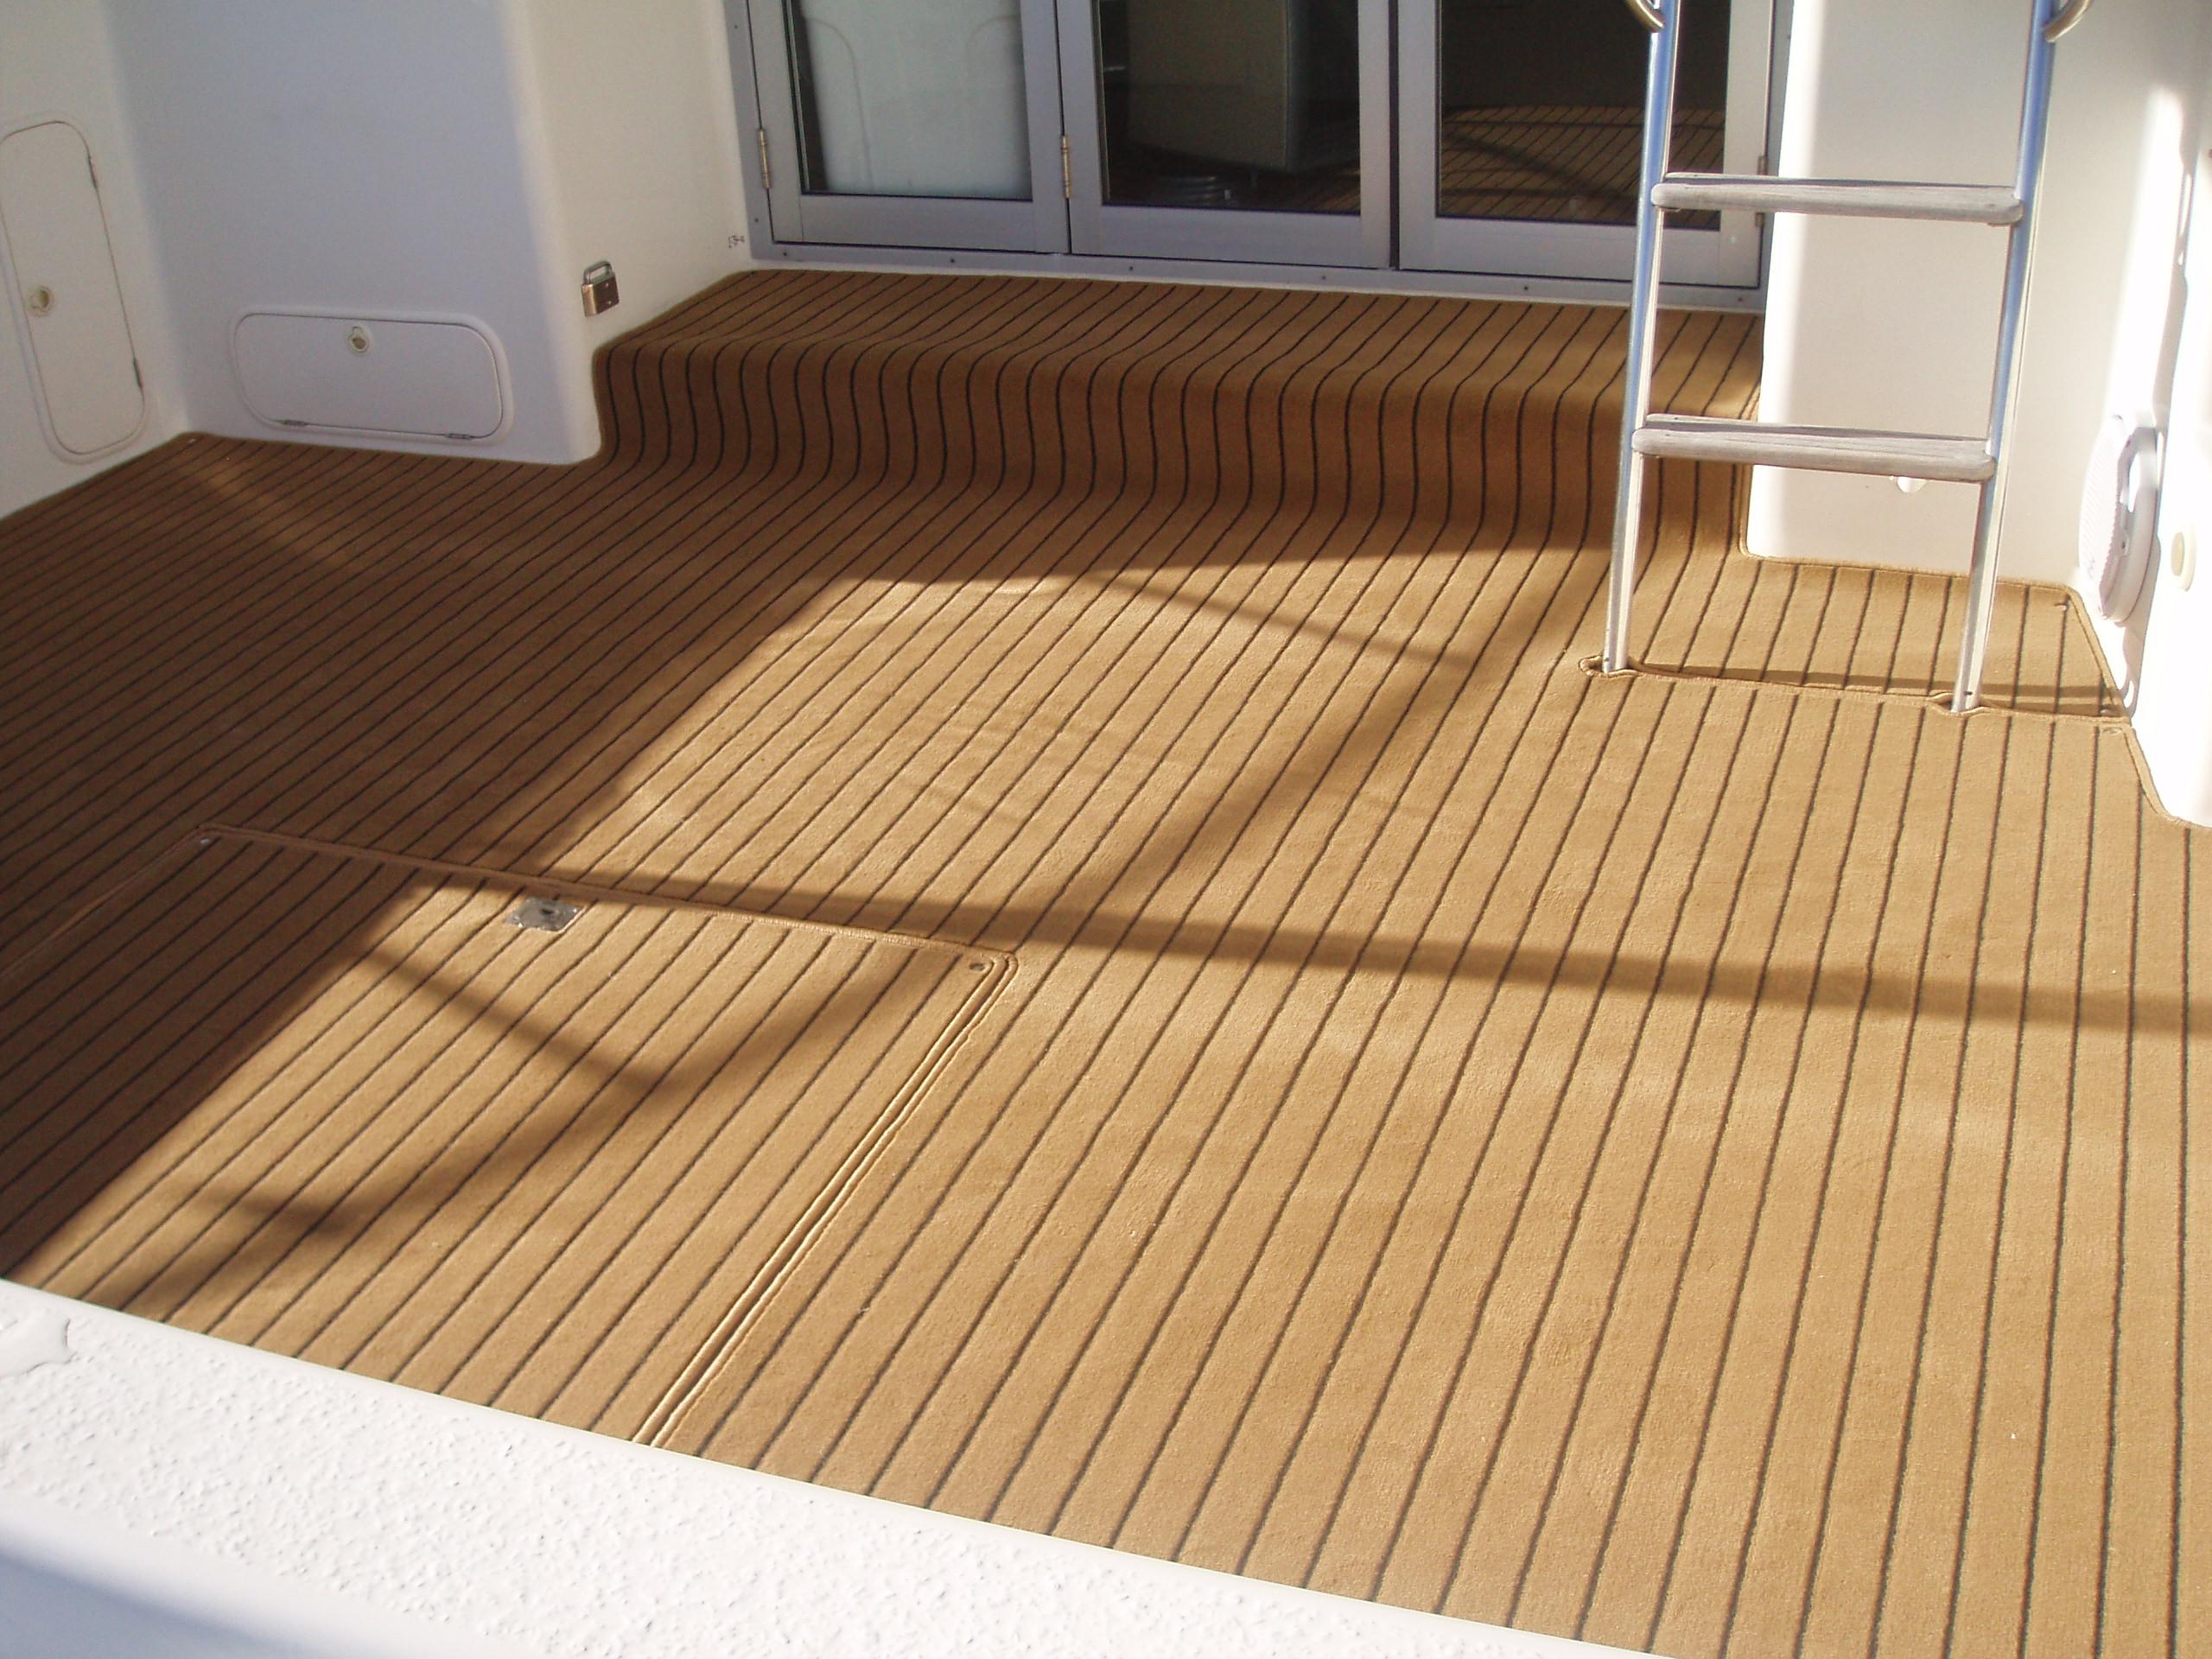 Black Teak Deck Marine Carpet Prestige Marine Trimmers